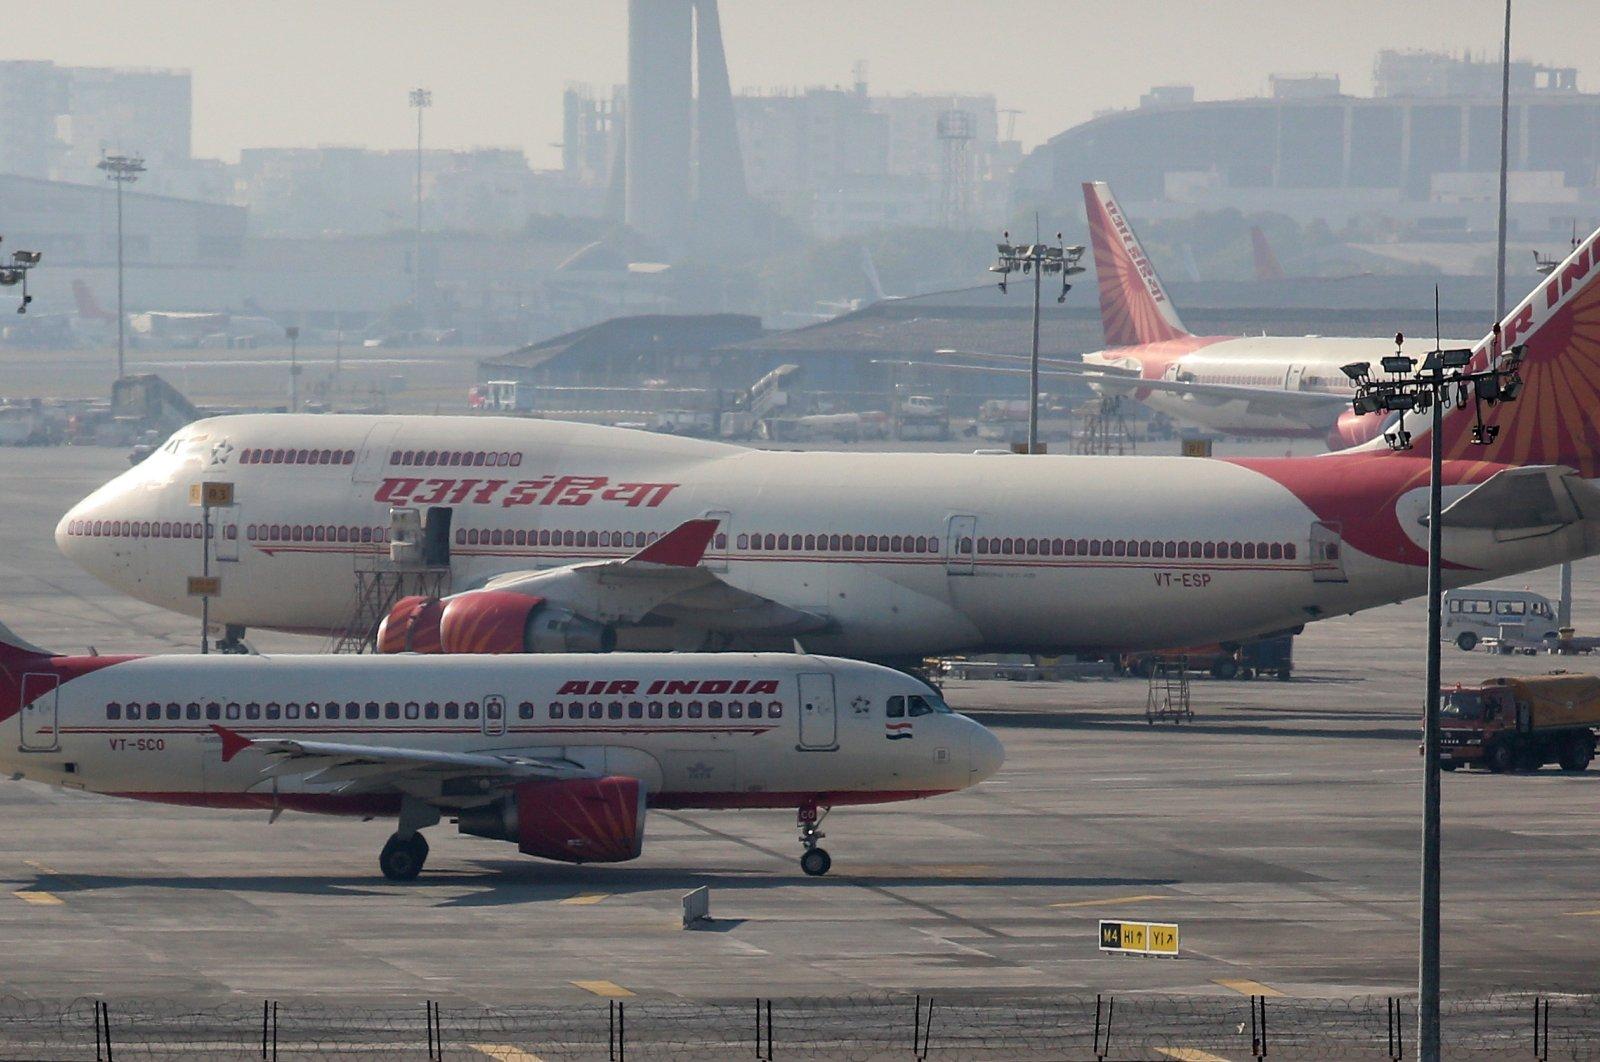 Air India passenger planes are seen at the Chhatrapati Shivaji International Airport in Mumbai, India, Dec. 17, 2015. (EPA Photo)